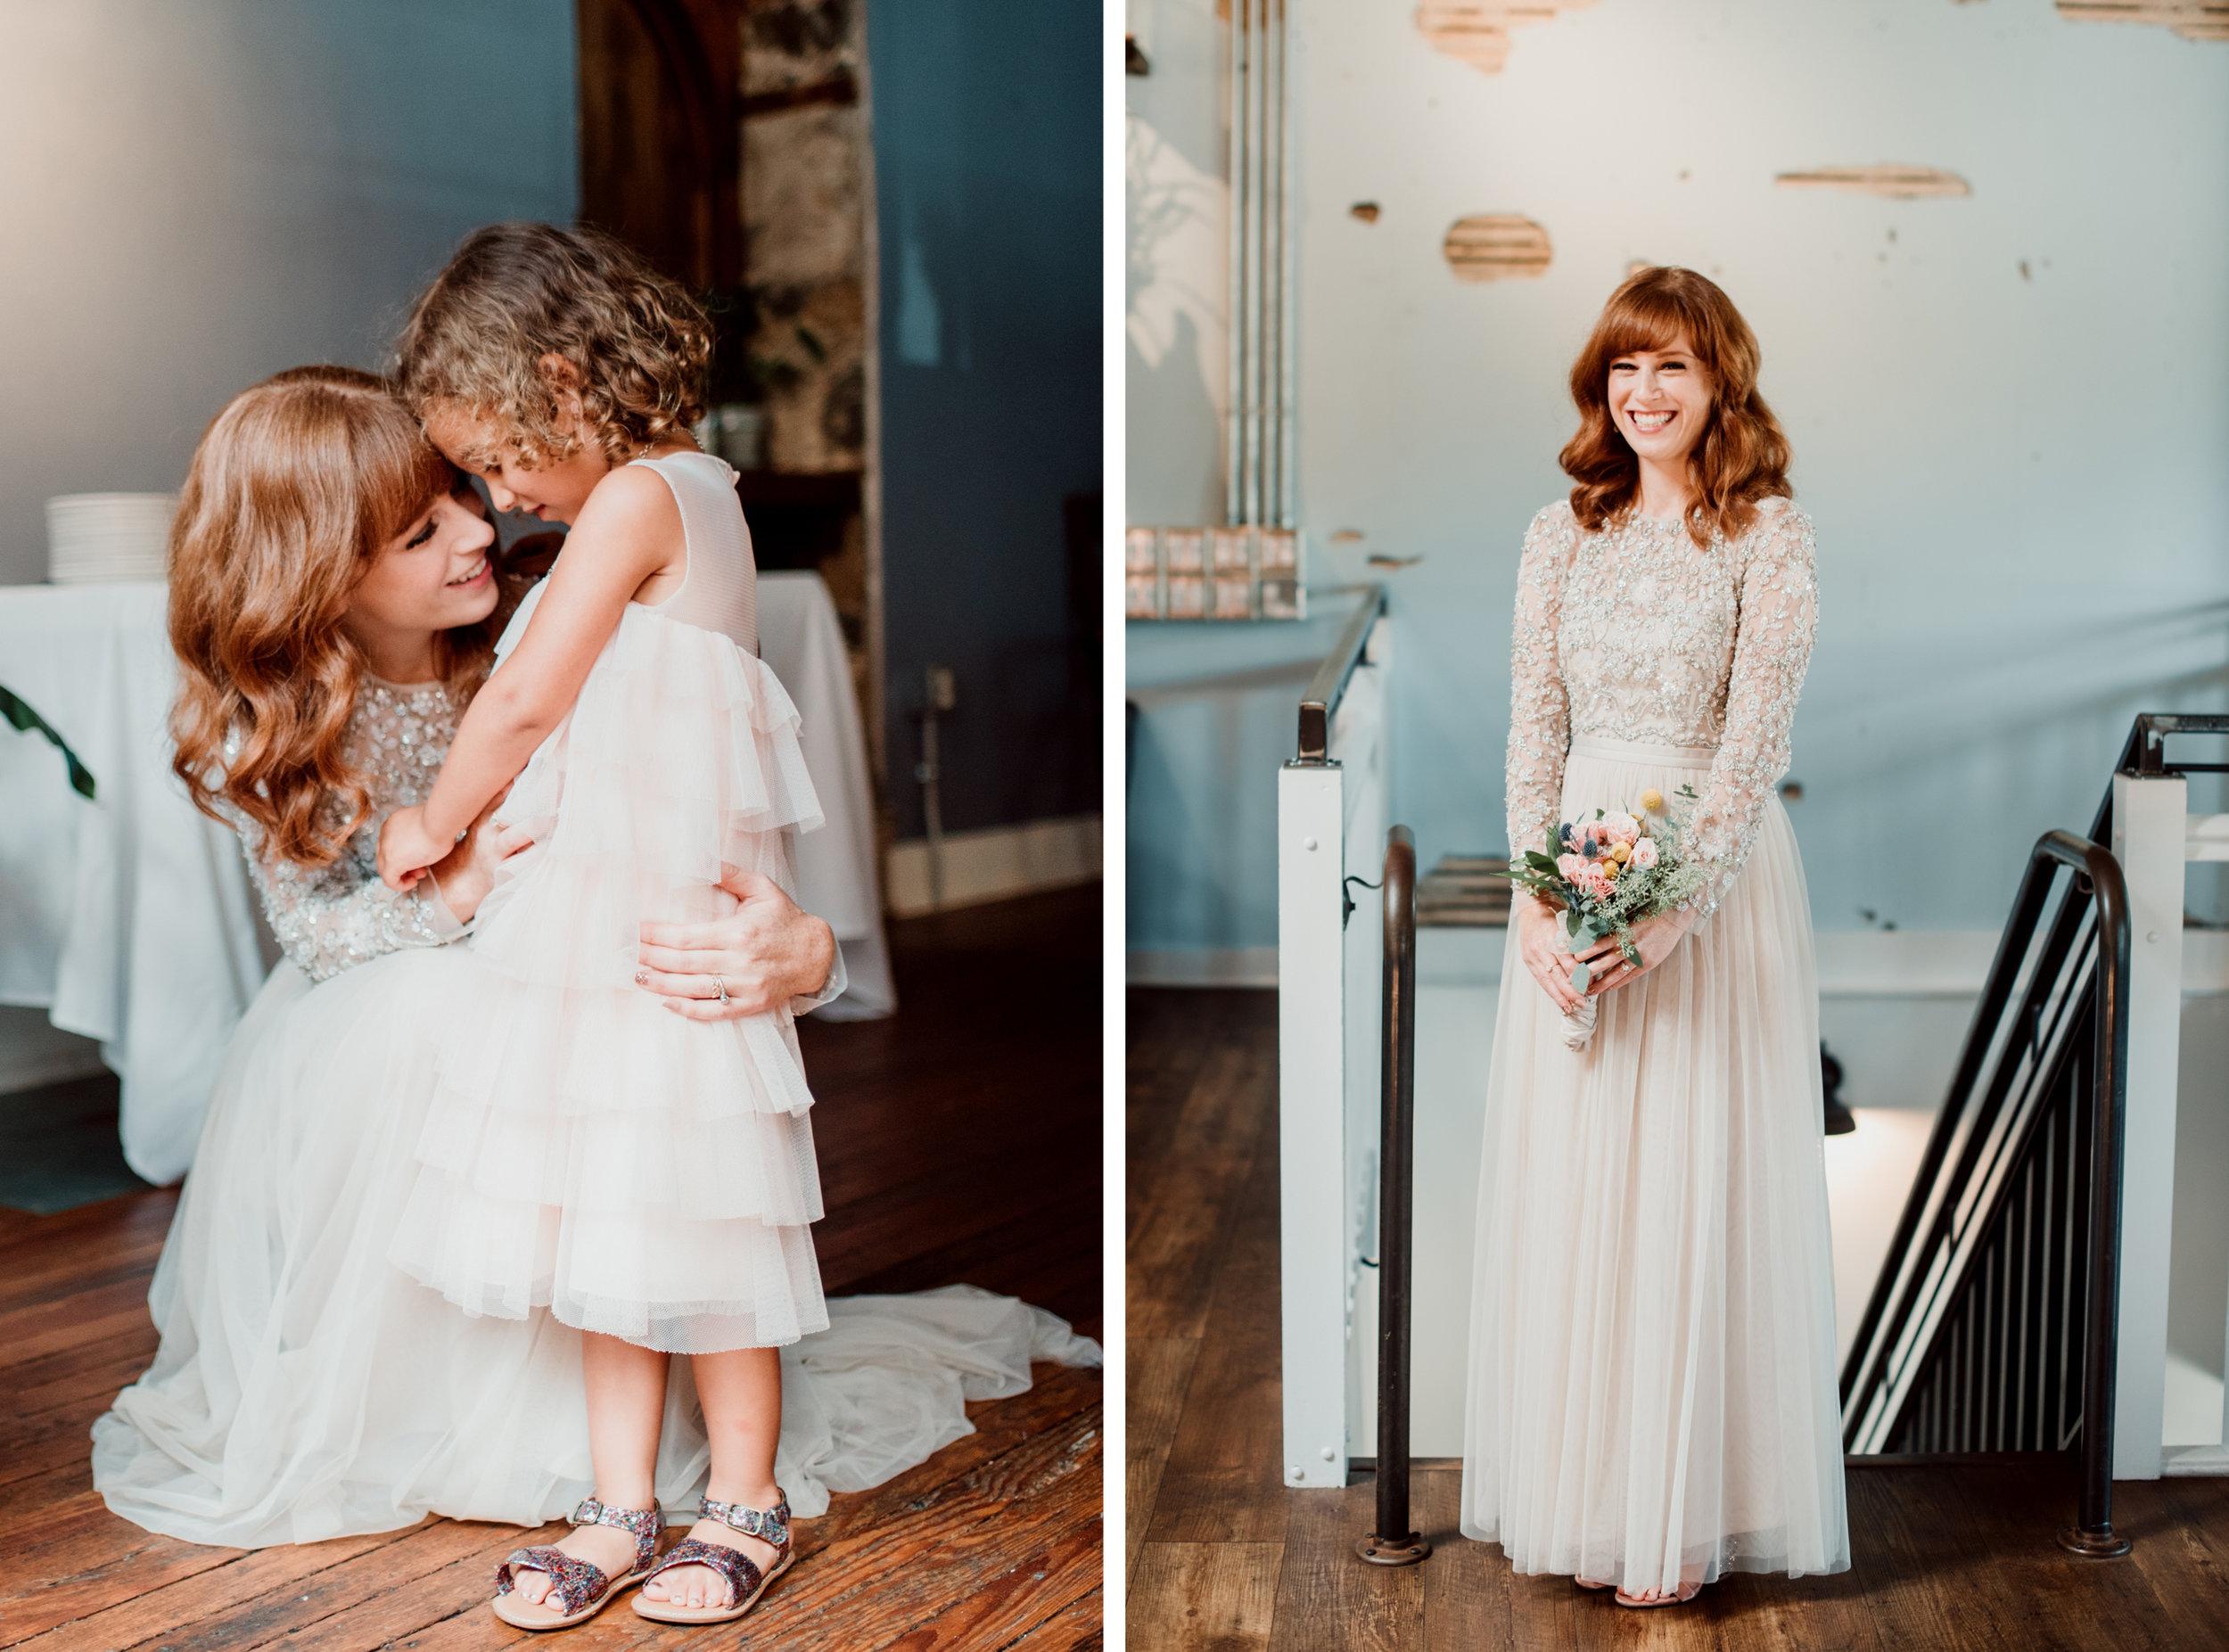 Philadelphia-wedding-photographer-la-cabra-brewery-diy-Peaberry-Photography-010.jpg